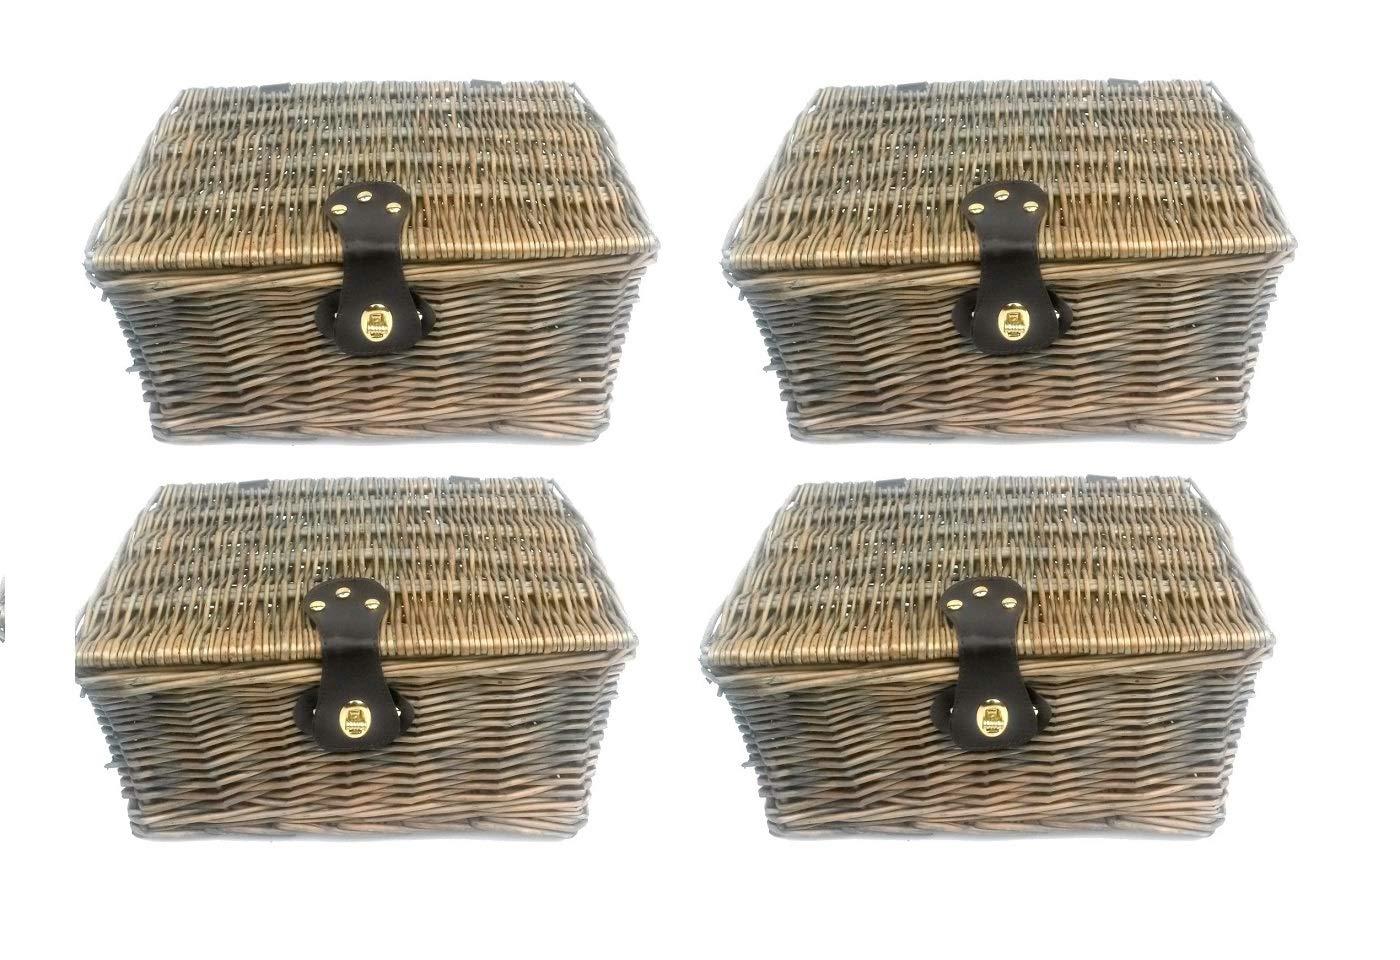 Topfurnishing Starkes Oak Flechtweide Picknick Geschenk Aufbewahrung Weihnachten Leere Geschenkkorb Korb - Set of 4 Large B077G869FW Krbe & Koffer Super Handwerkskunst